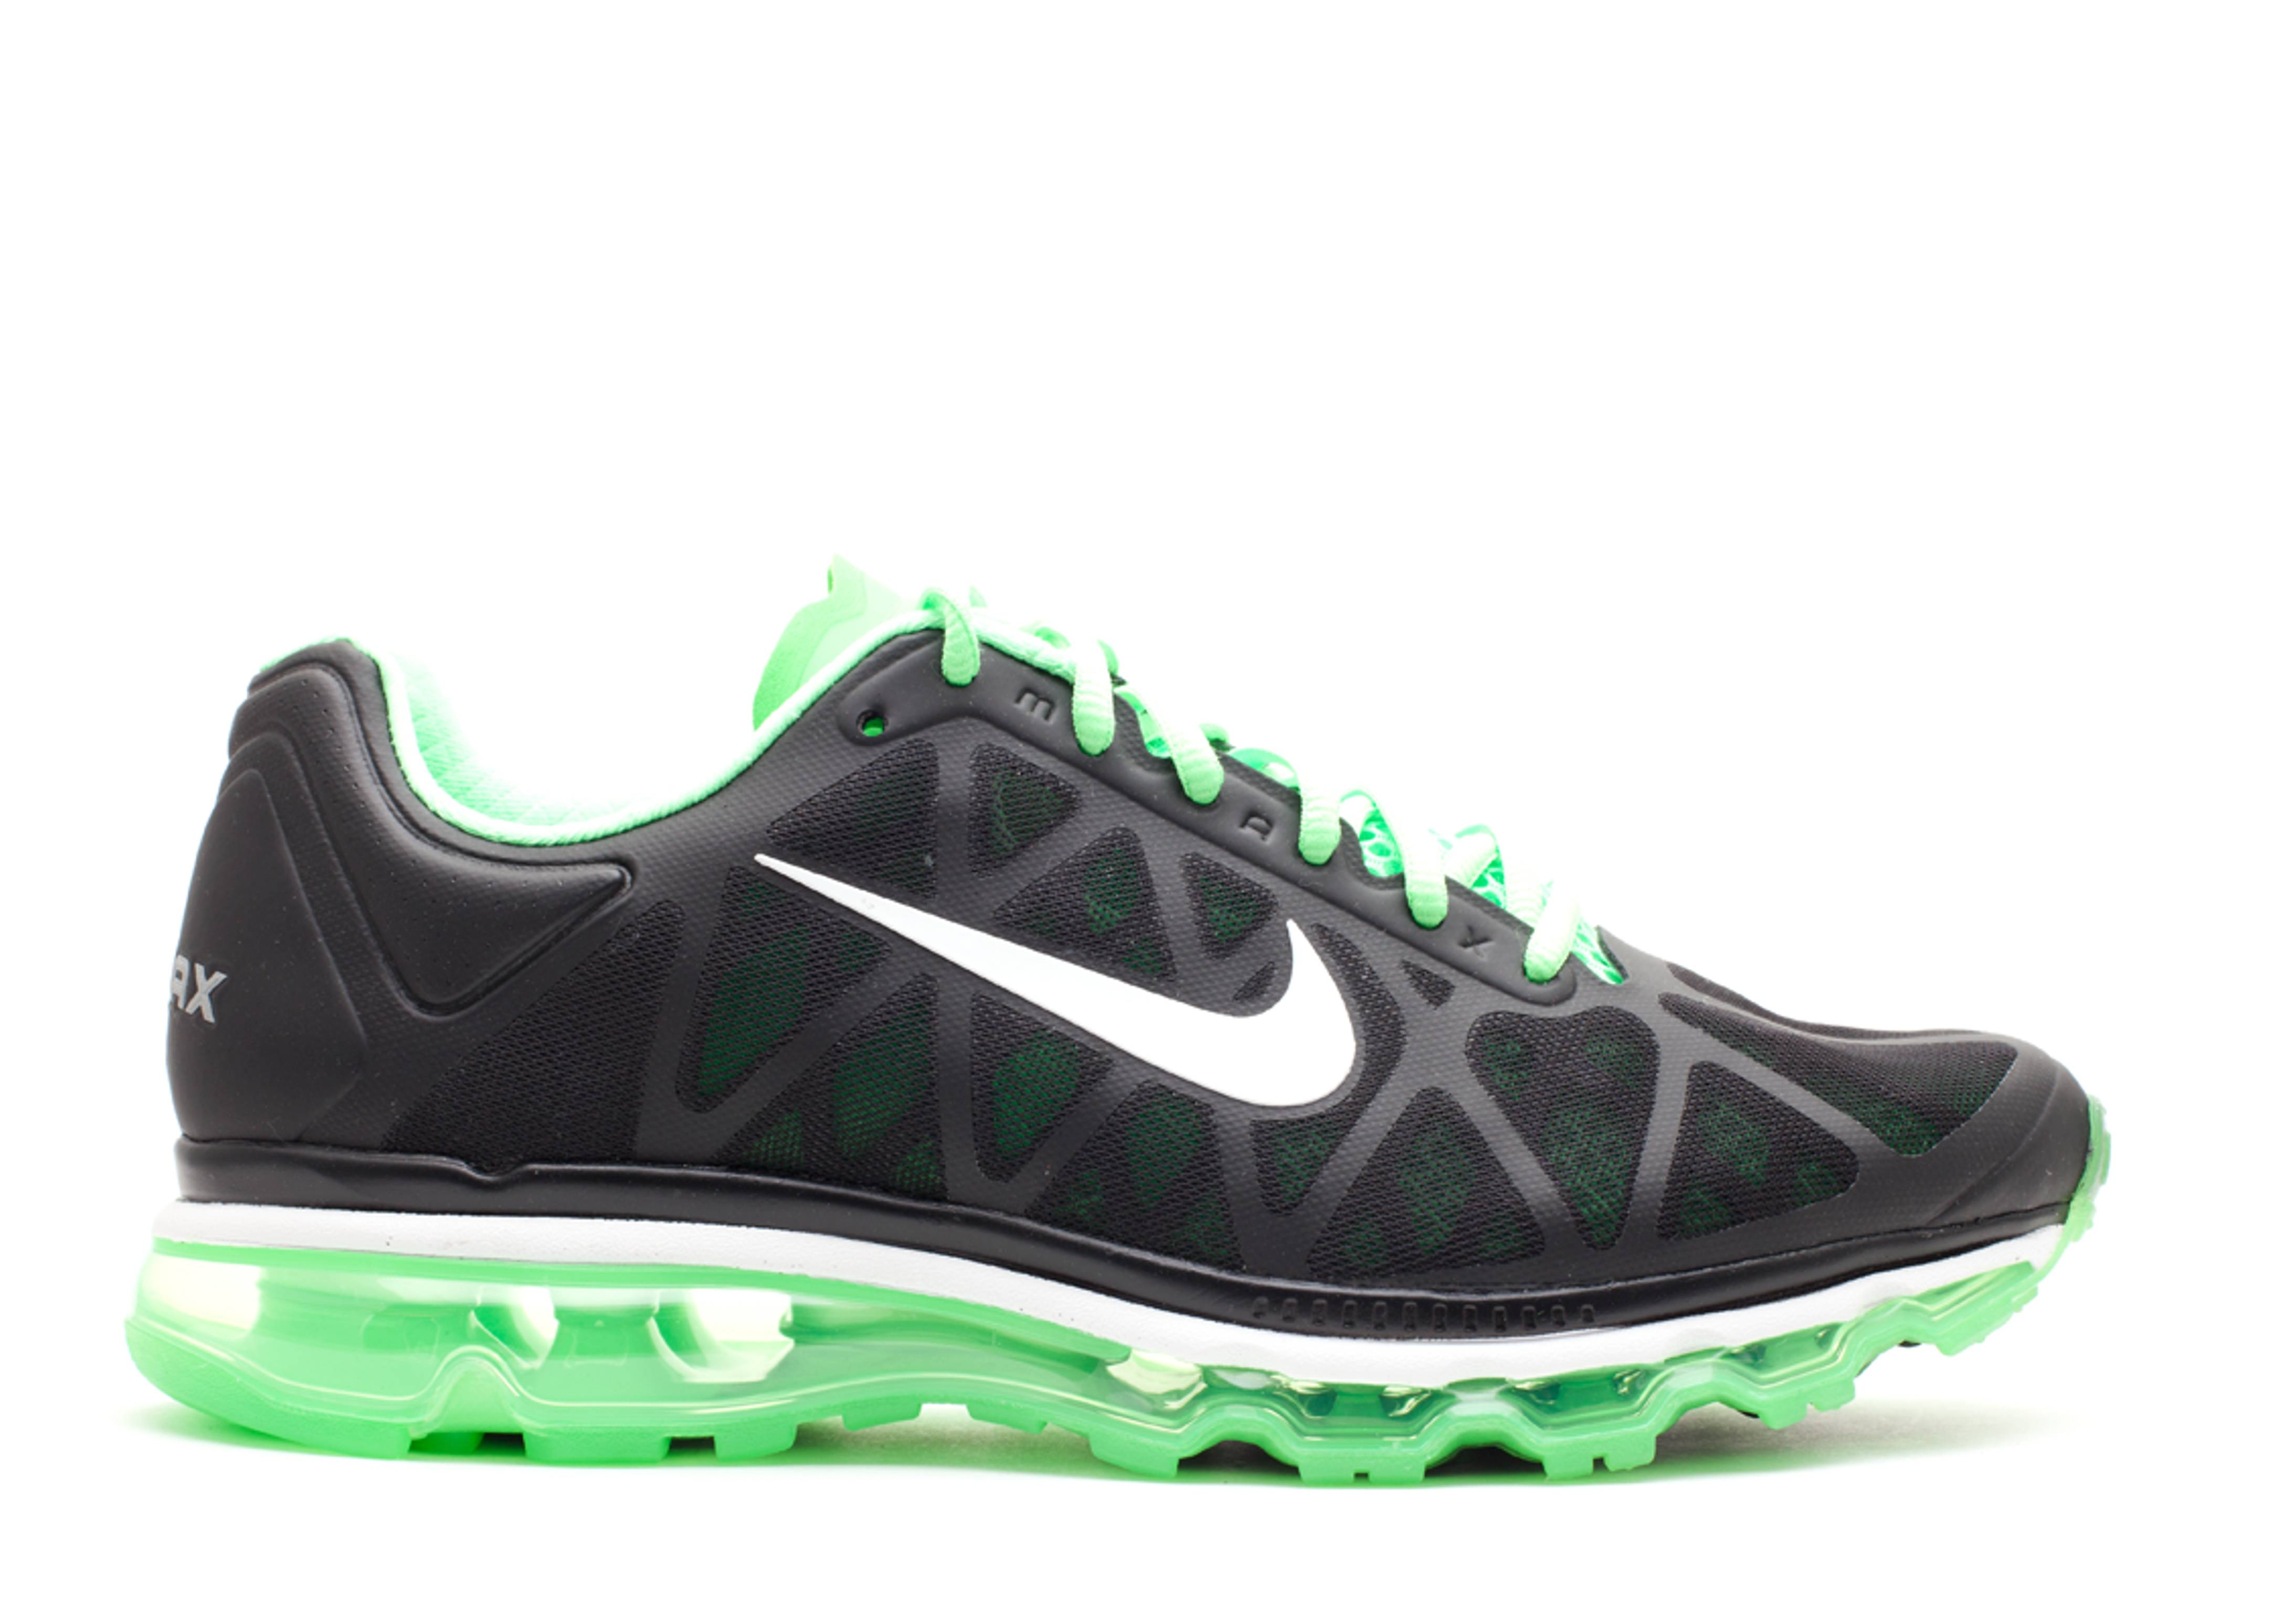 Nike air max 2011 noir et vert lime